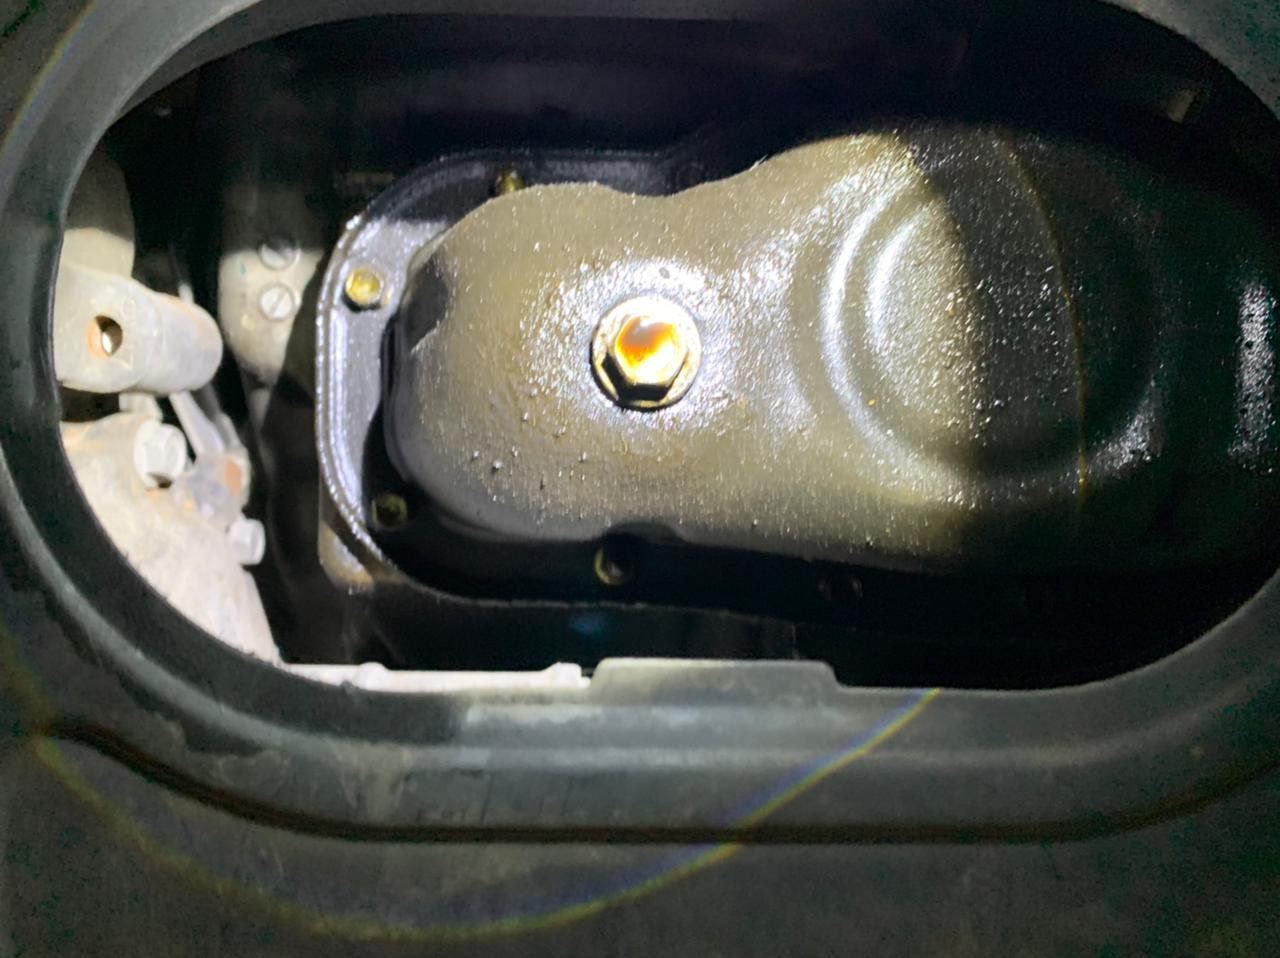 I think my 1GR is leaking oil.-whatsapp-image-2021-05-13-17-02-17-jpeg